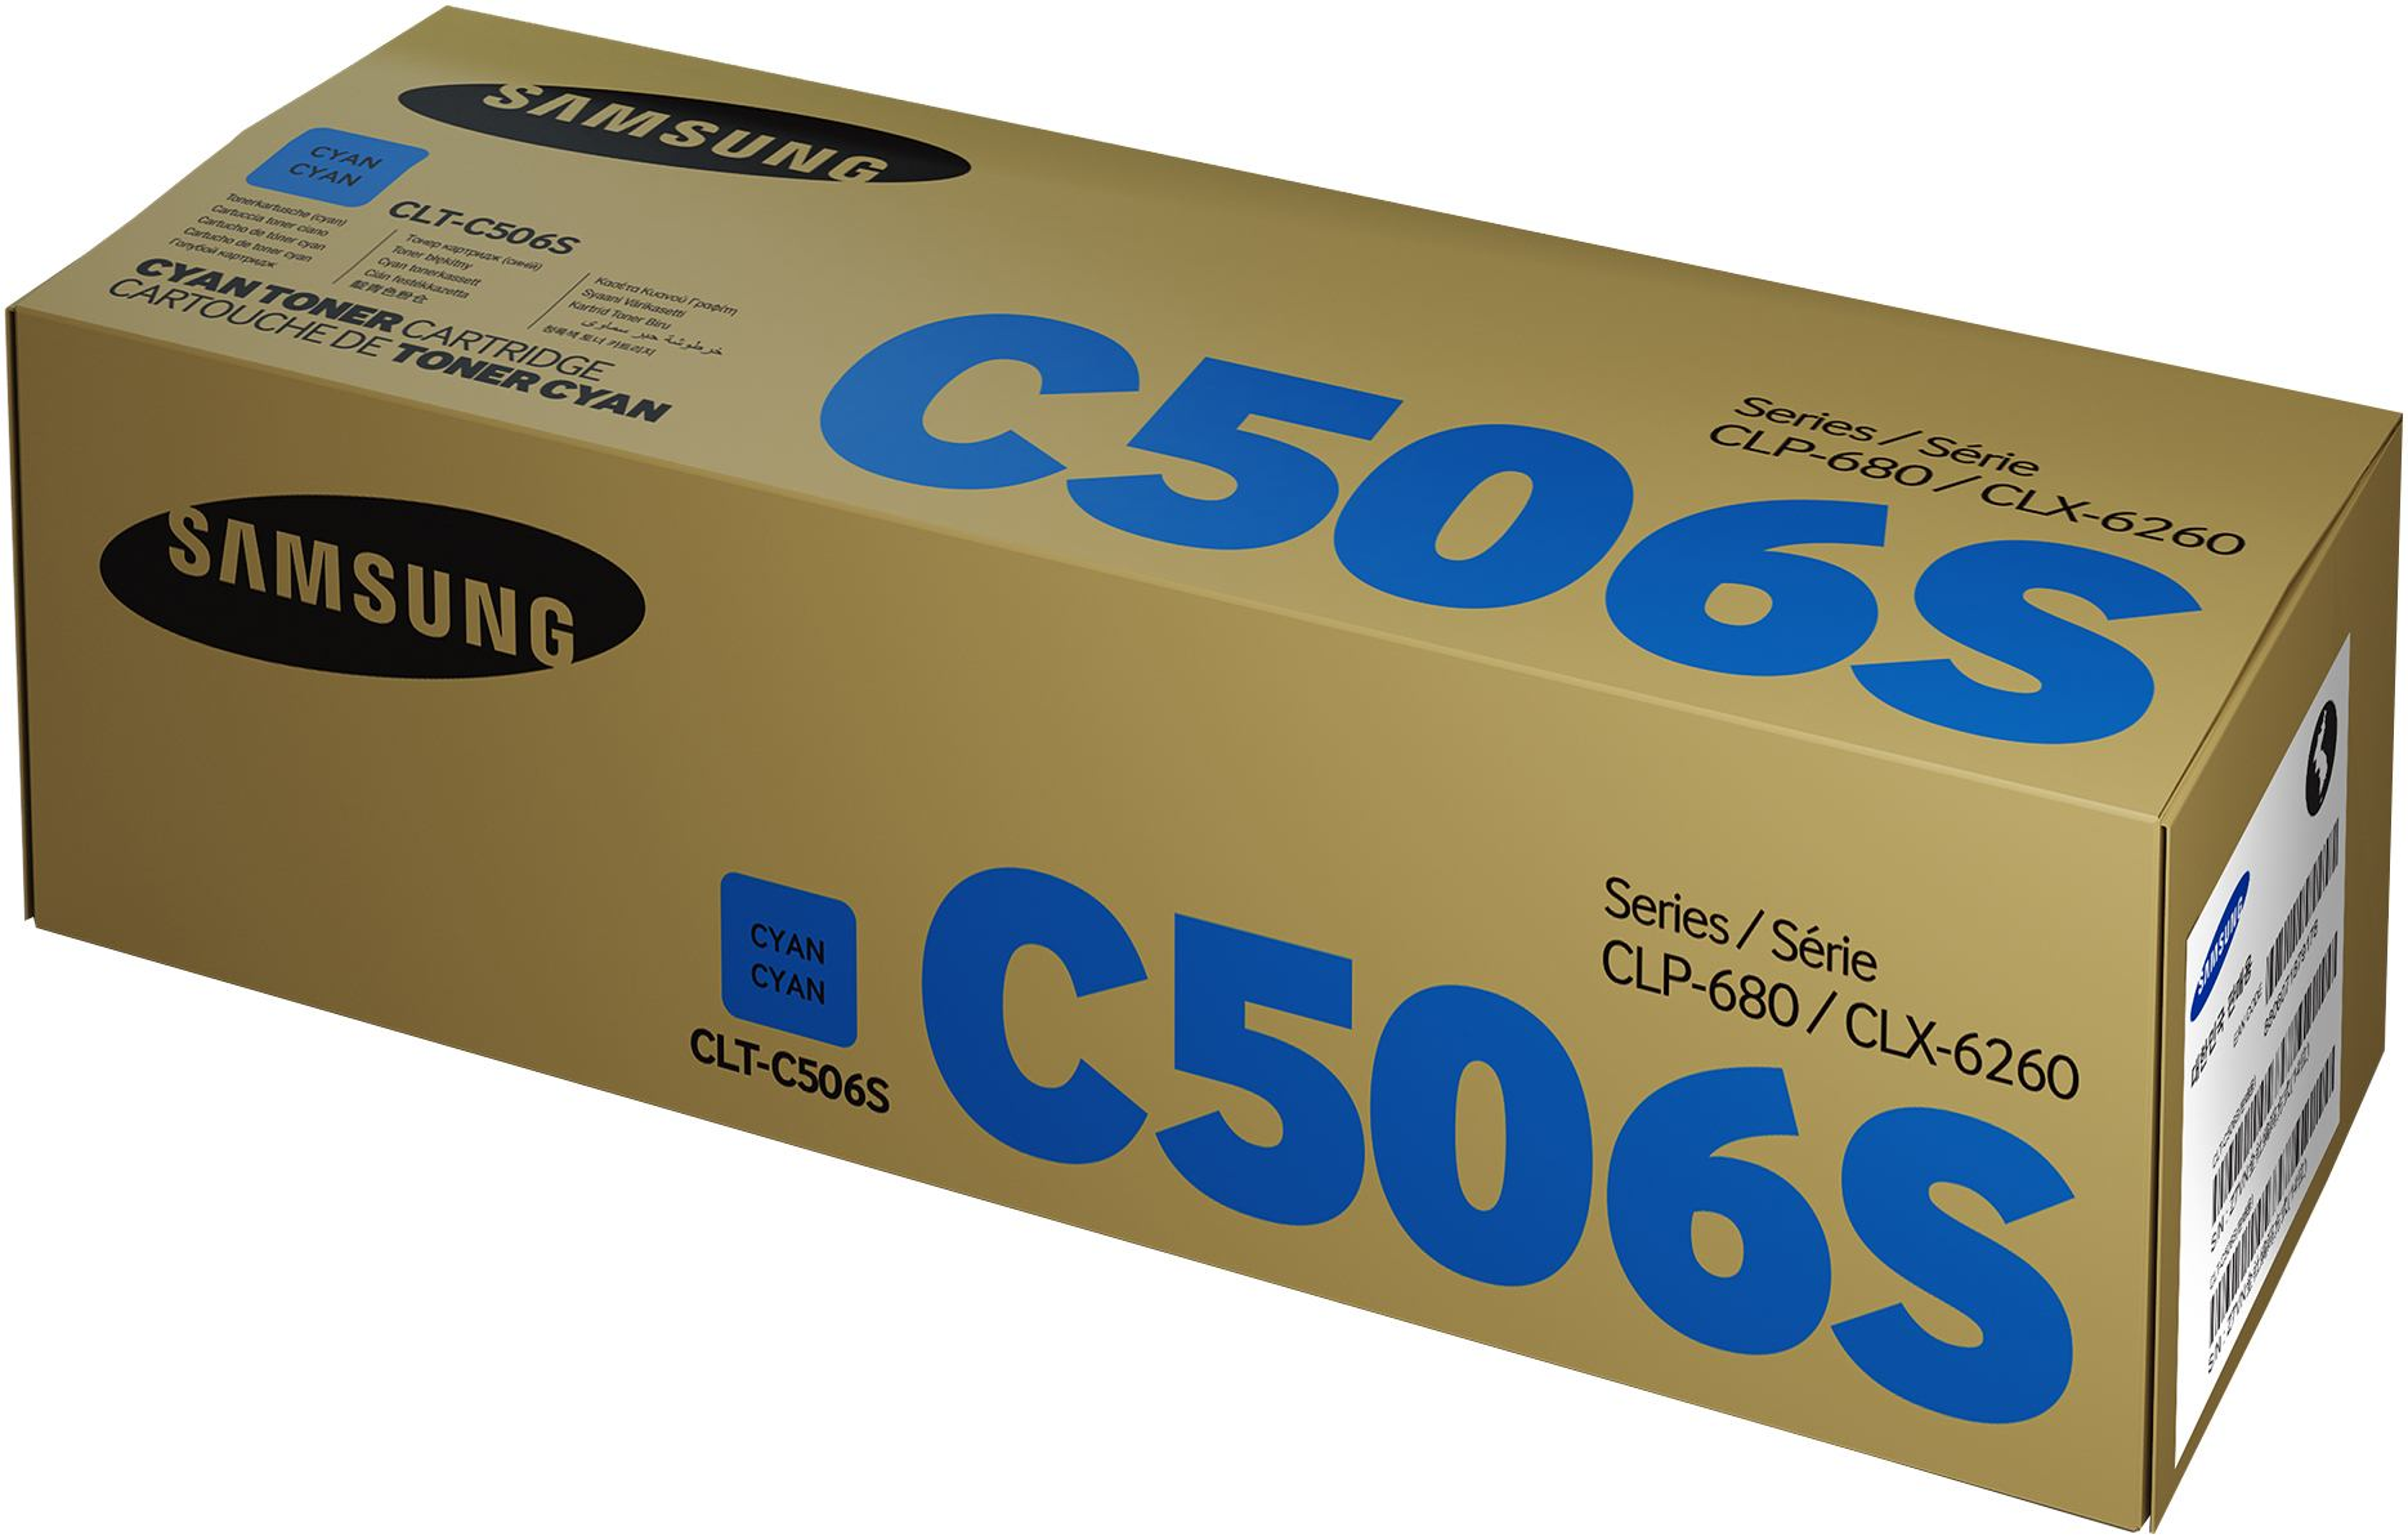 2044314-HP-CLT-C506S-Originale-Ciano-1-pezzo-i-Samsung-CLT-C506S-Cyan-Toner-Ca